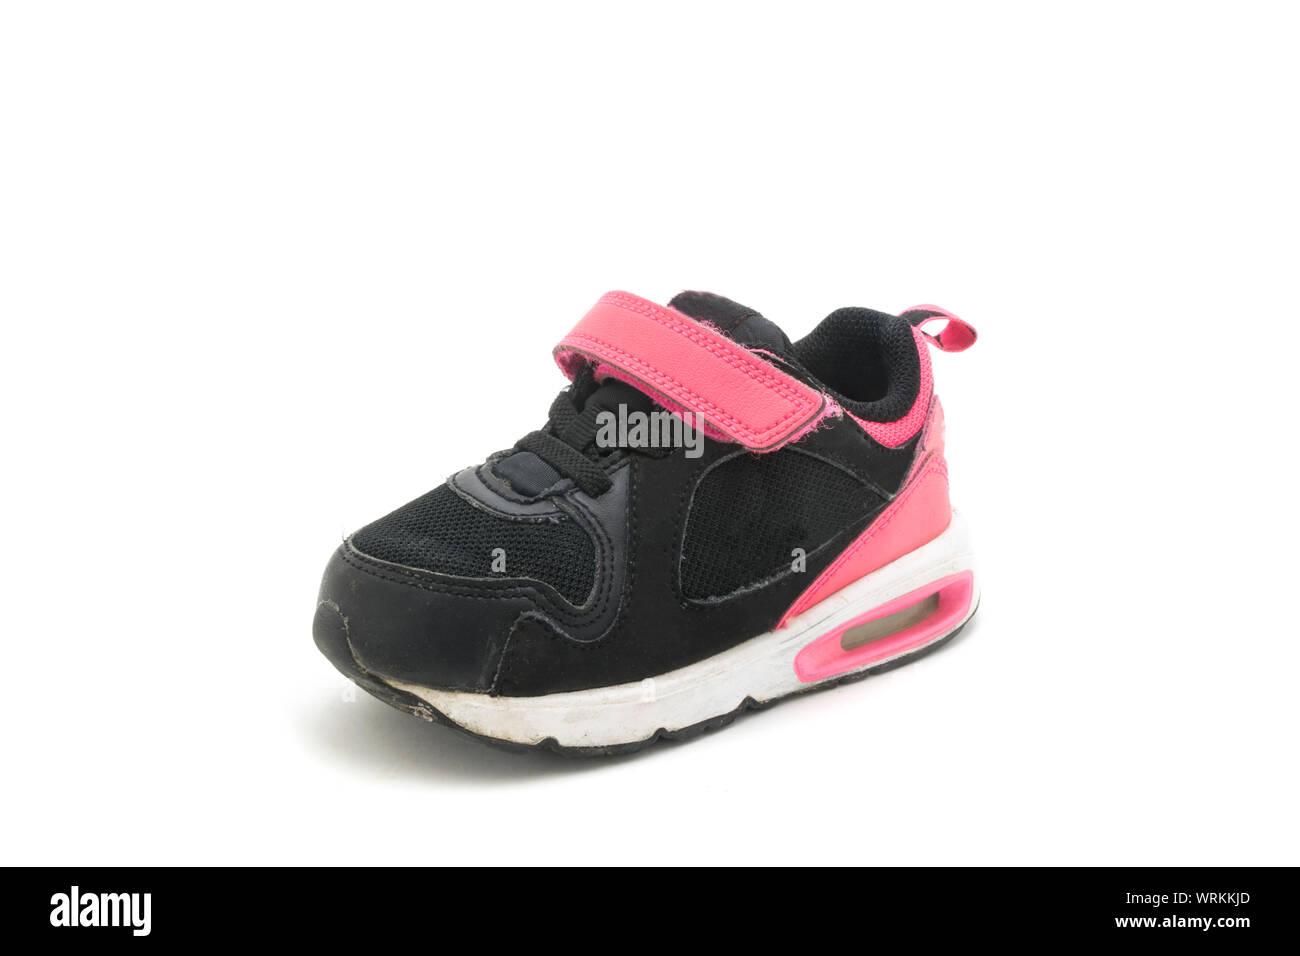 Supra Atom Toddler black red white little Kids elastic shoelaces